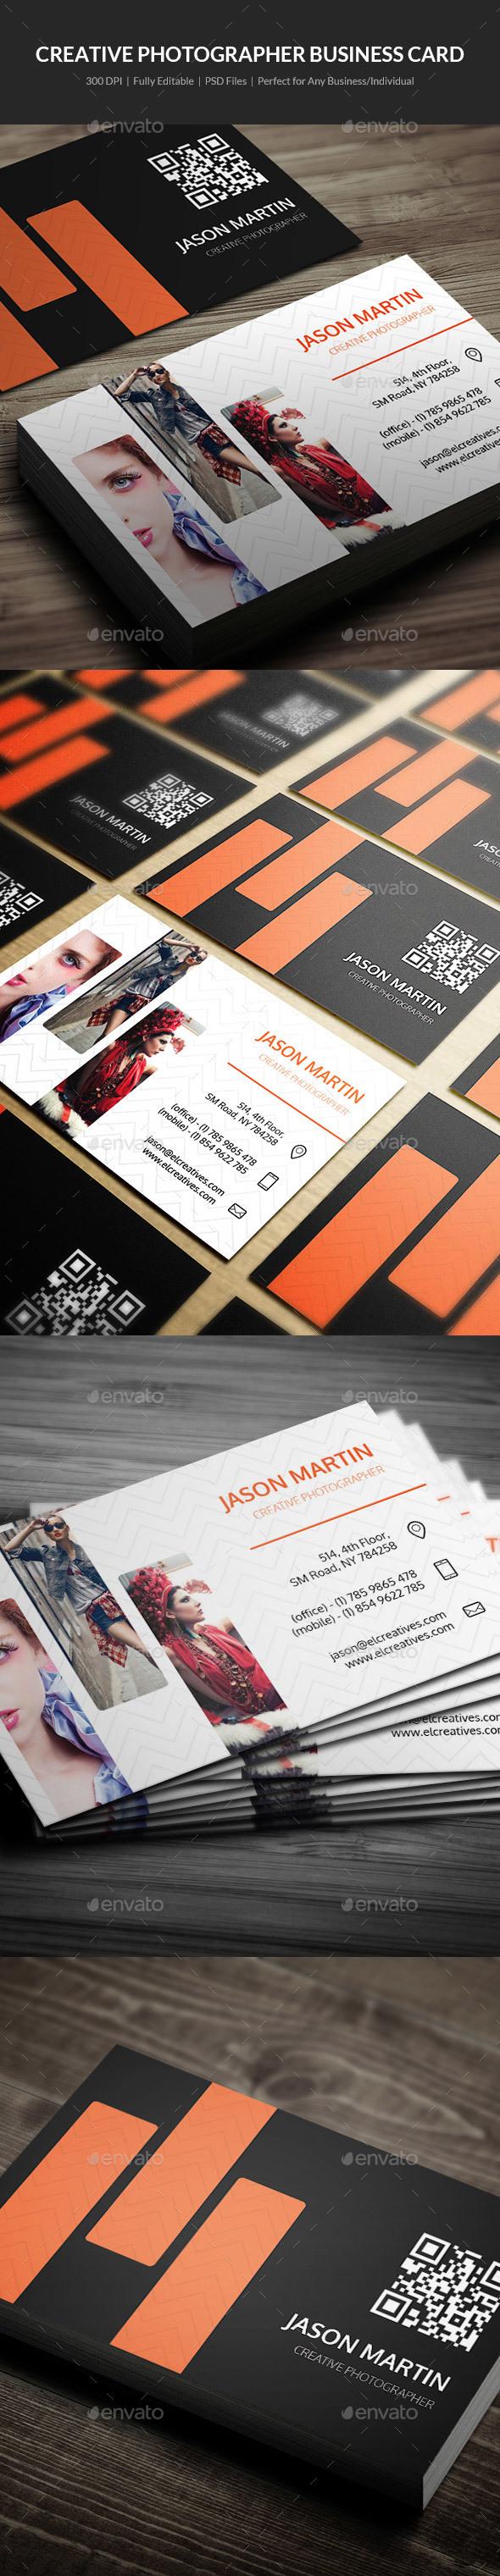 Creative Photographer Business Card - 27 - Creative Business Cards